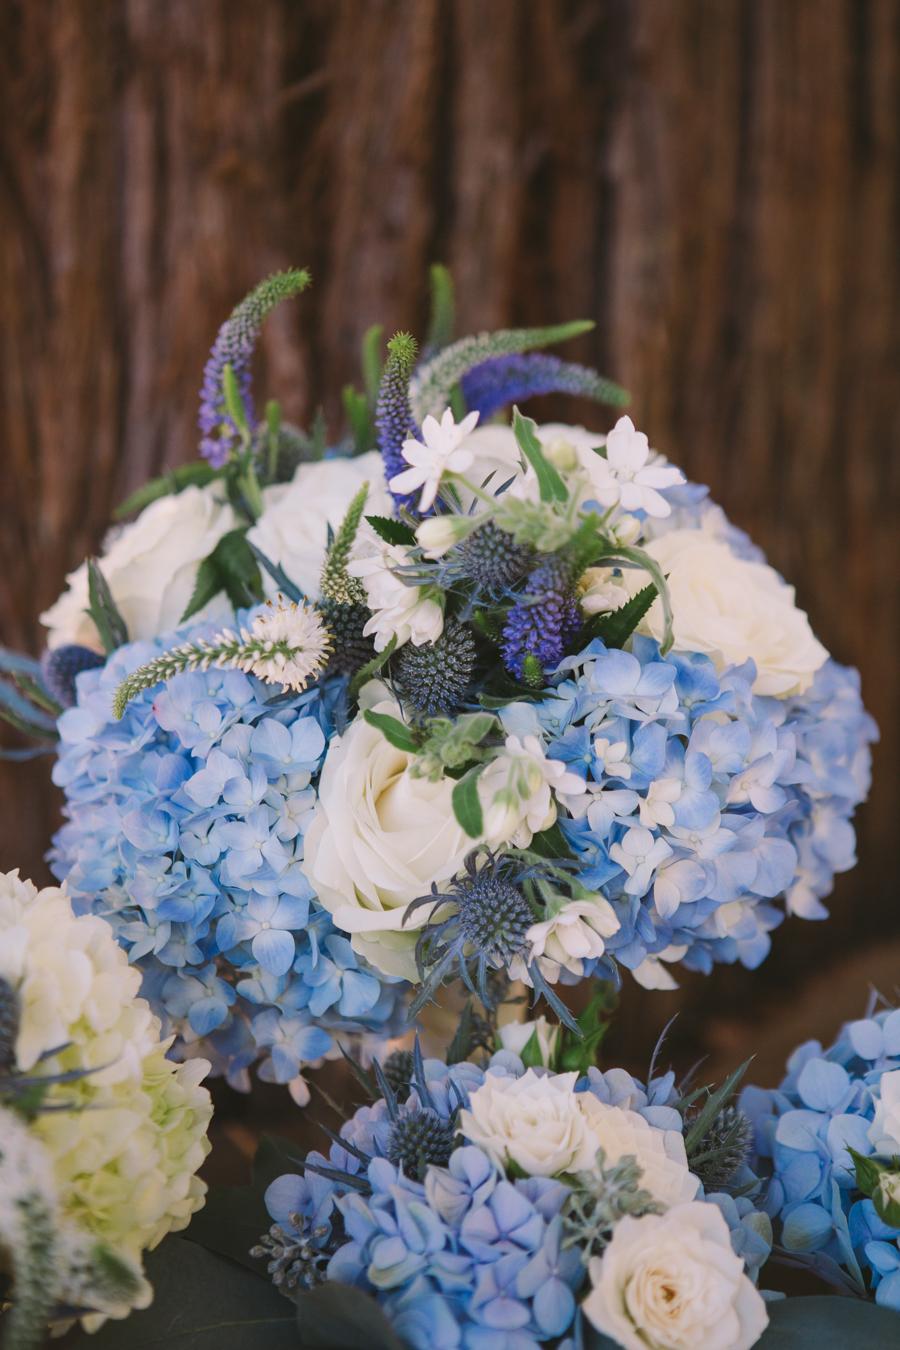 pema-osel-ling-wedding-photography (28)